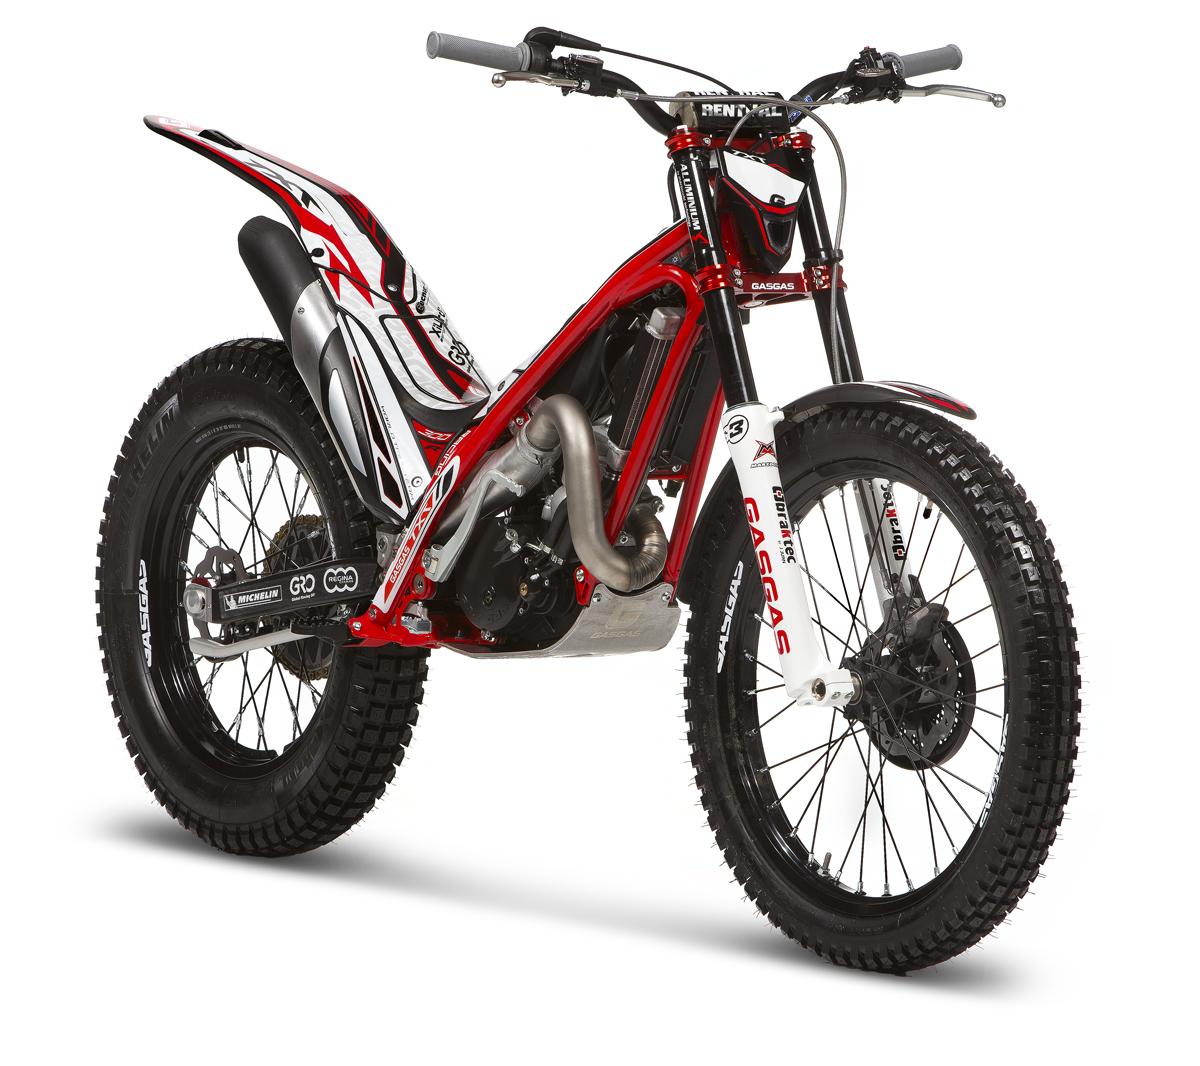 2014 gas gas txt trials bike dirt bike magazine. Black Bedroom Furniture Sets. Home Design Ideas